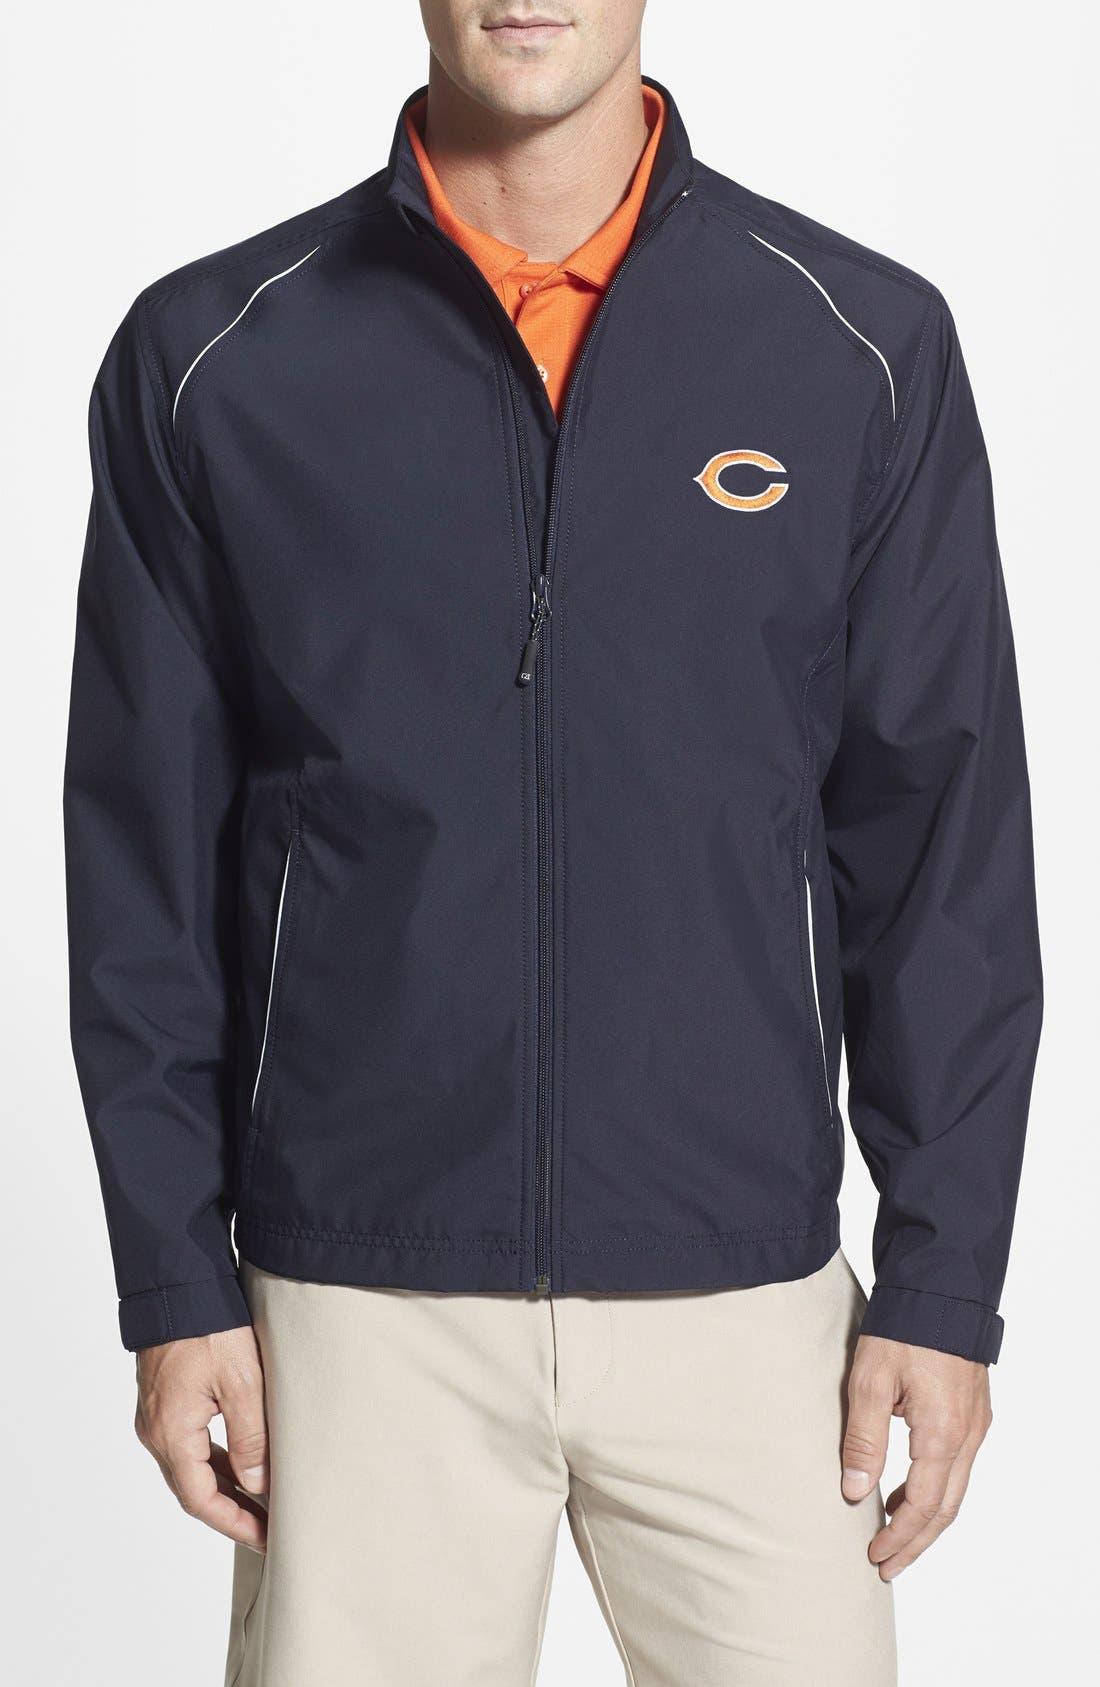 Cutter & Buck Chicago Bears - Beacon WeatherTec Wind & Water Resistant Jacket